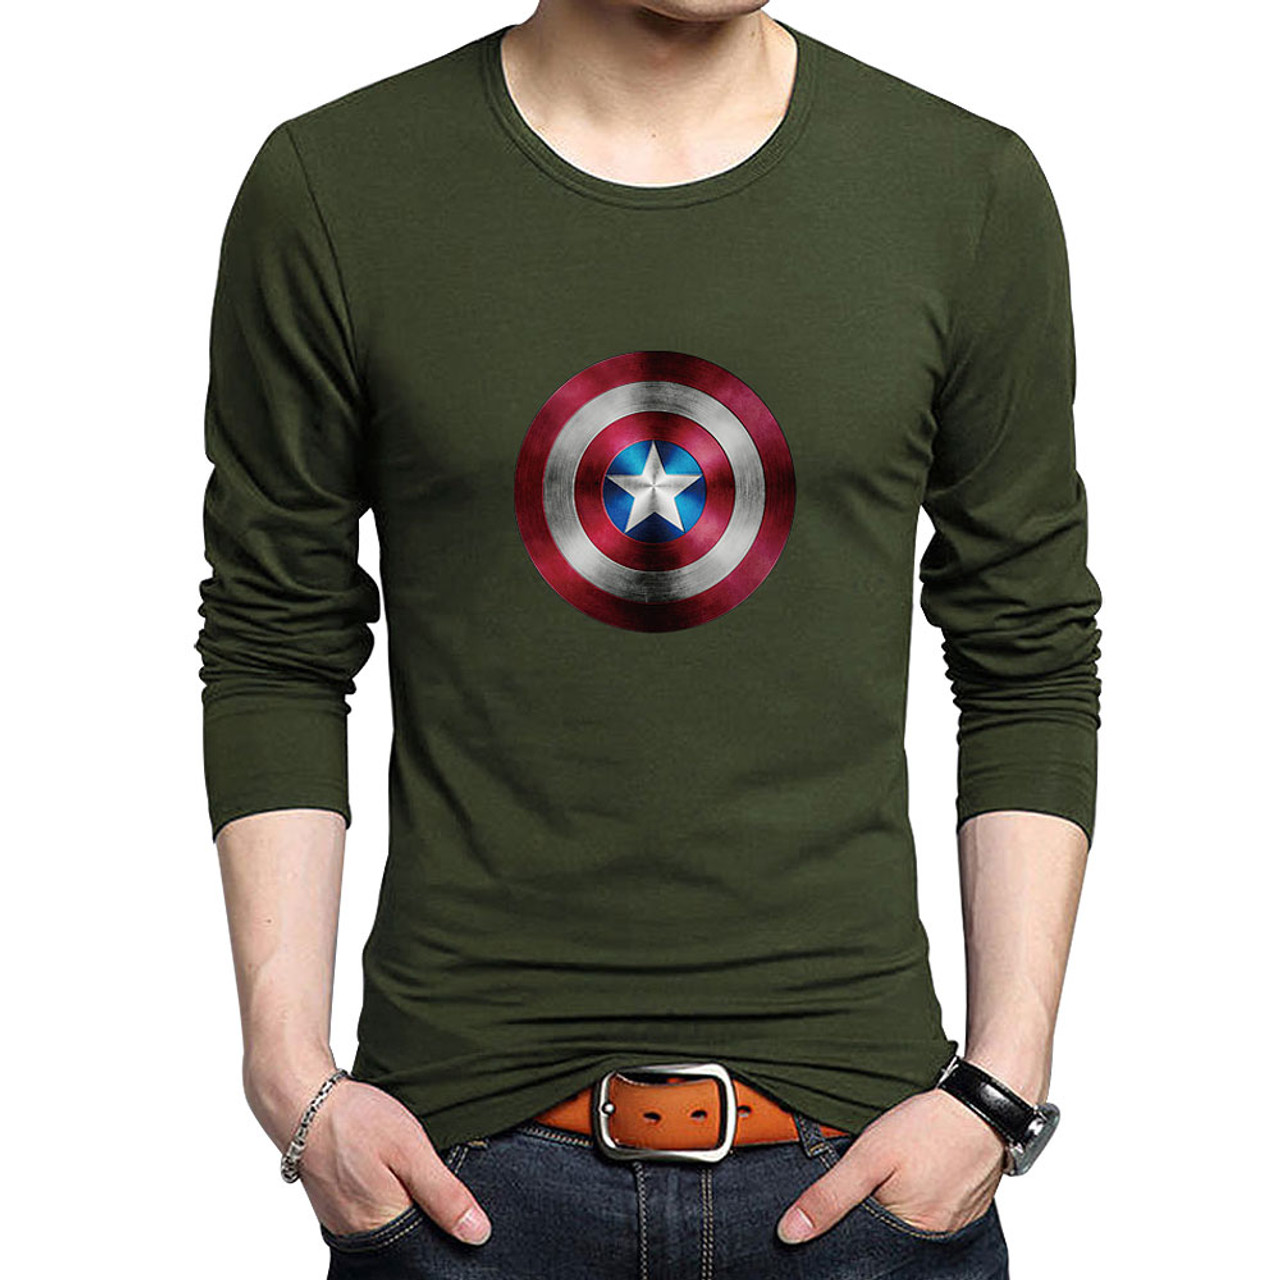 Men Plus Size  O Neck Cotton T-shirt Marvel Superhero Captain America Shield Tee